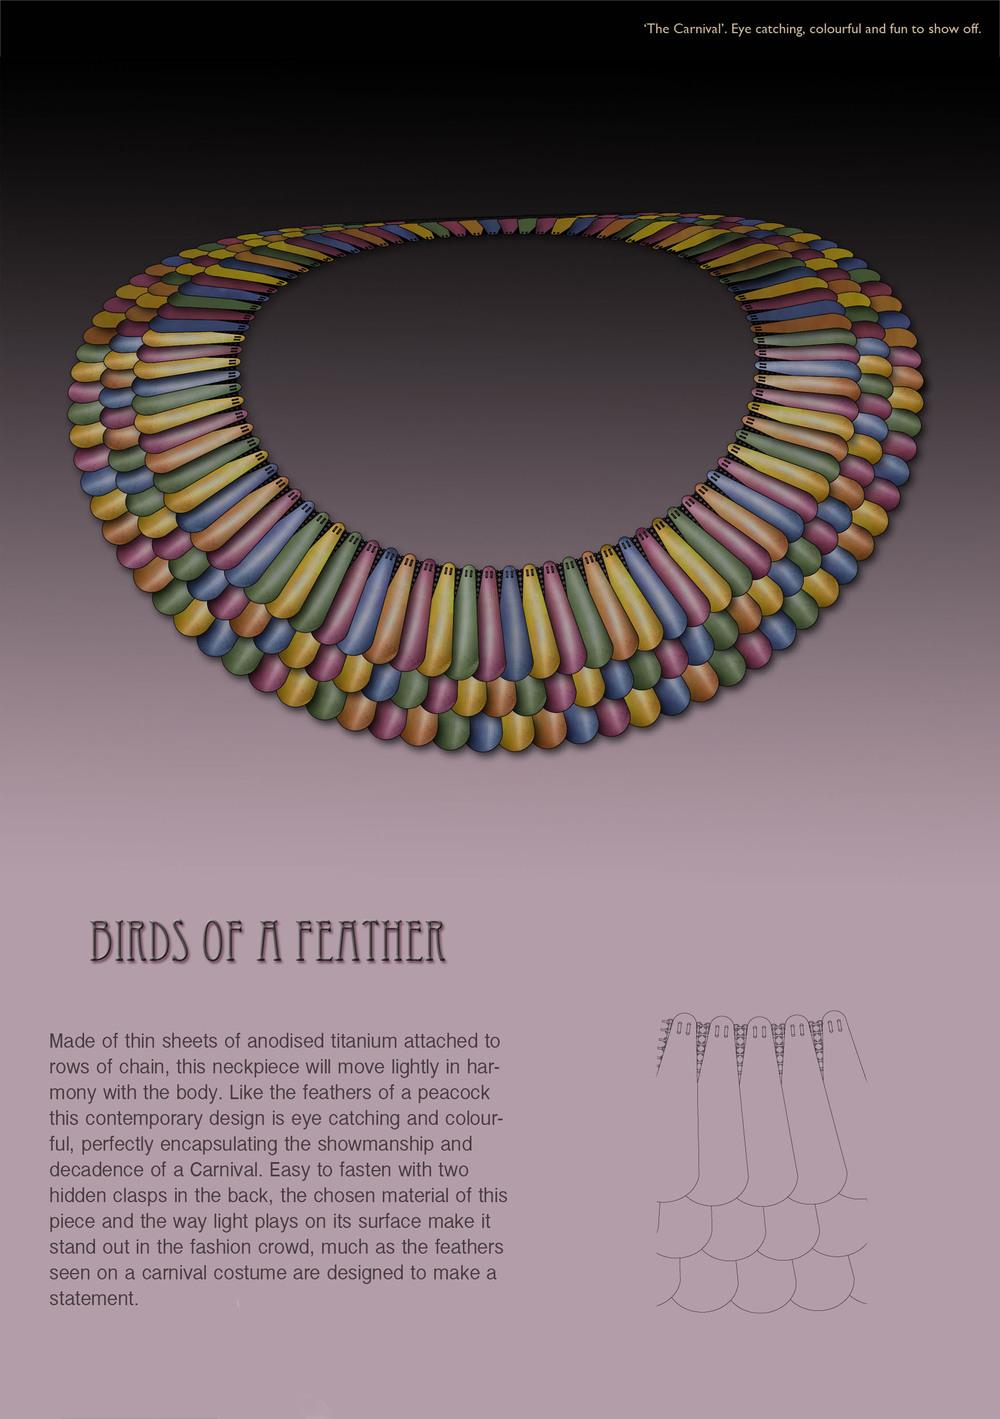 alma sophia design - birds of a feather